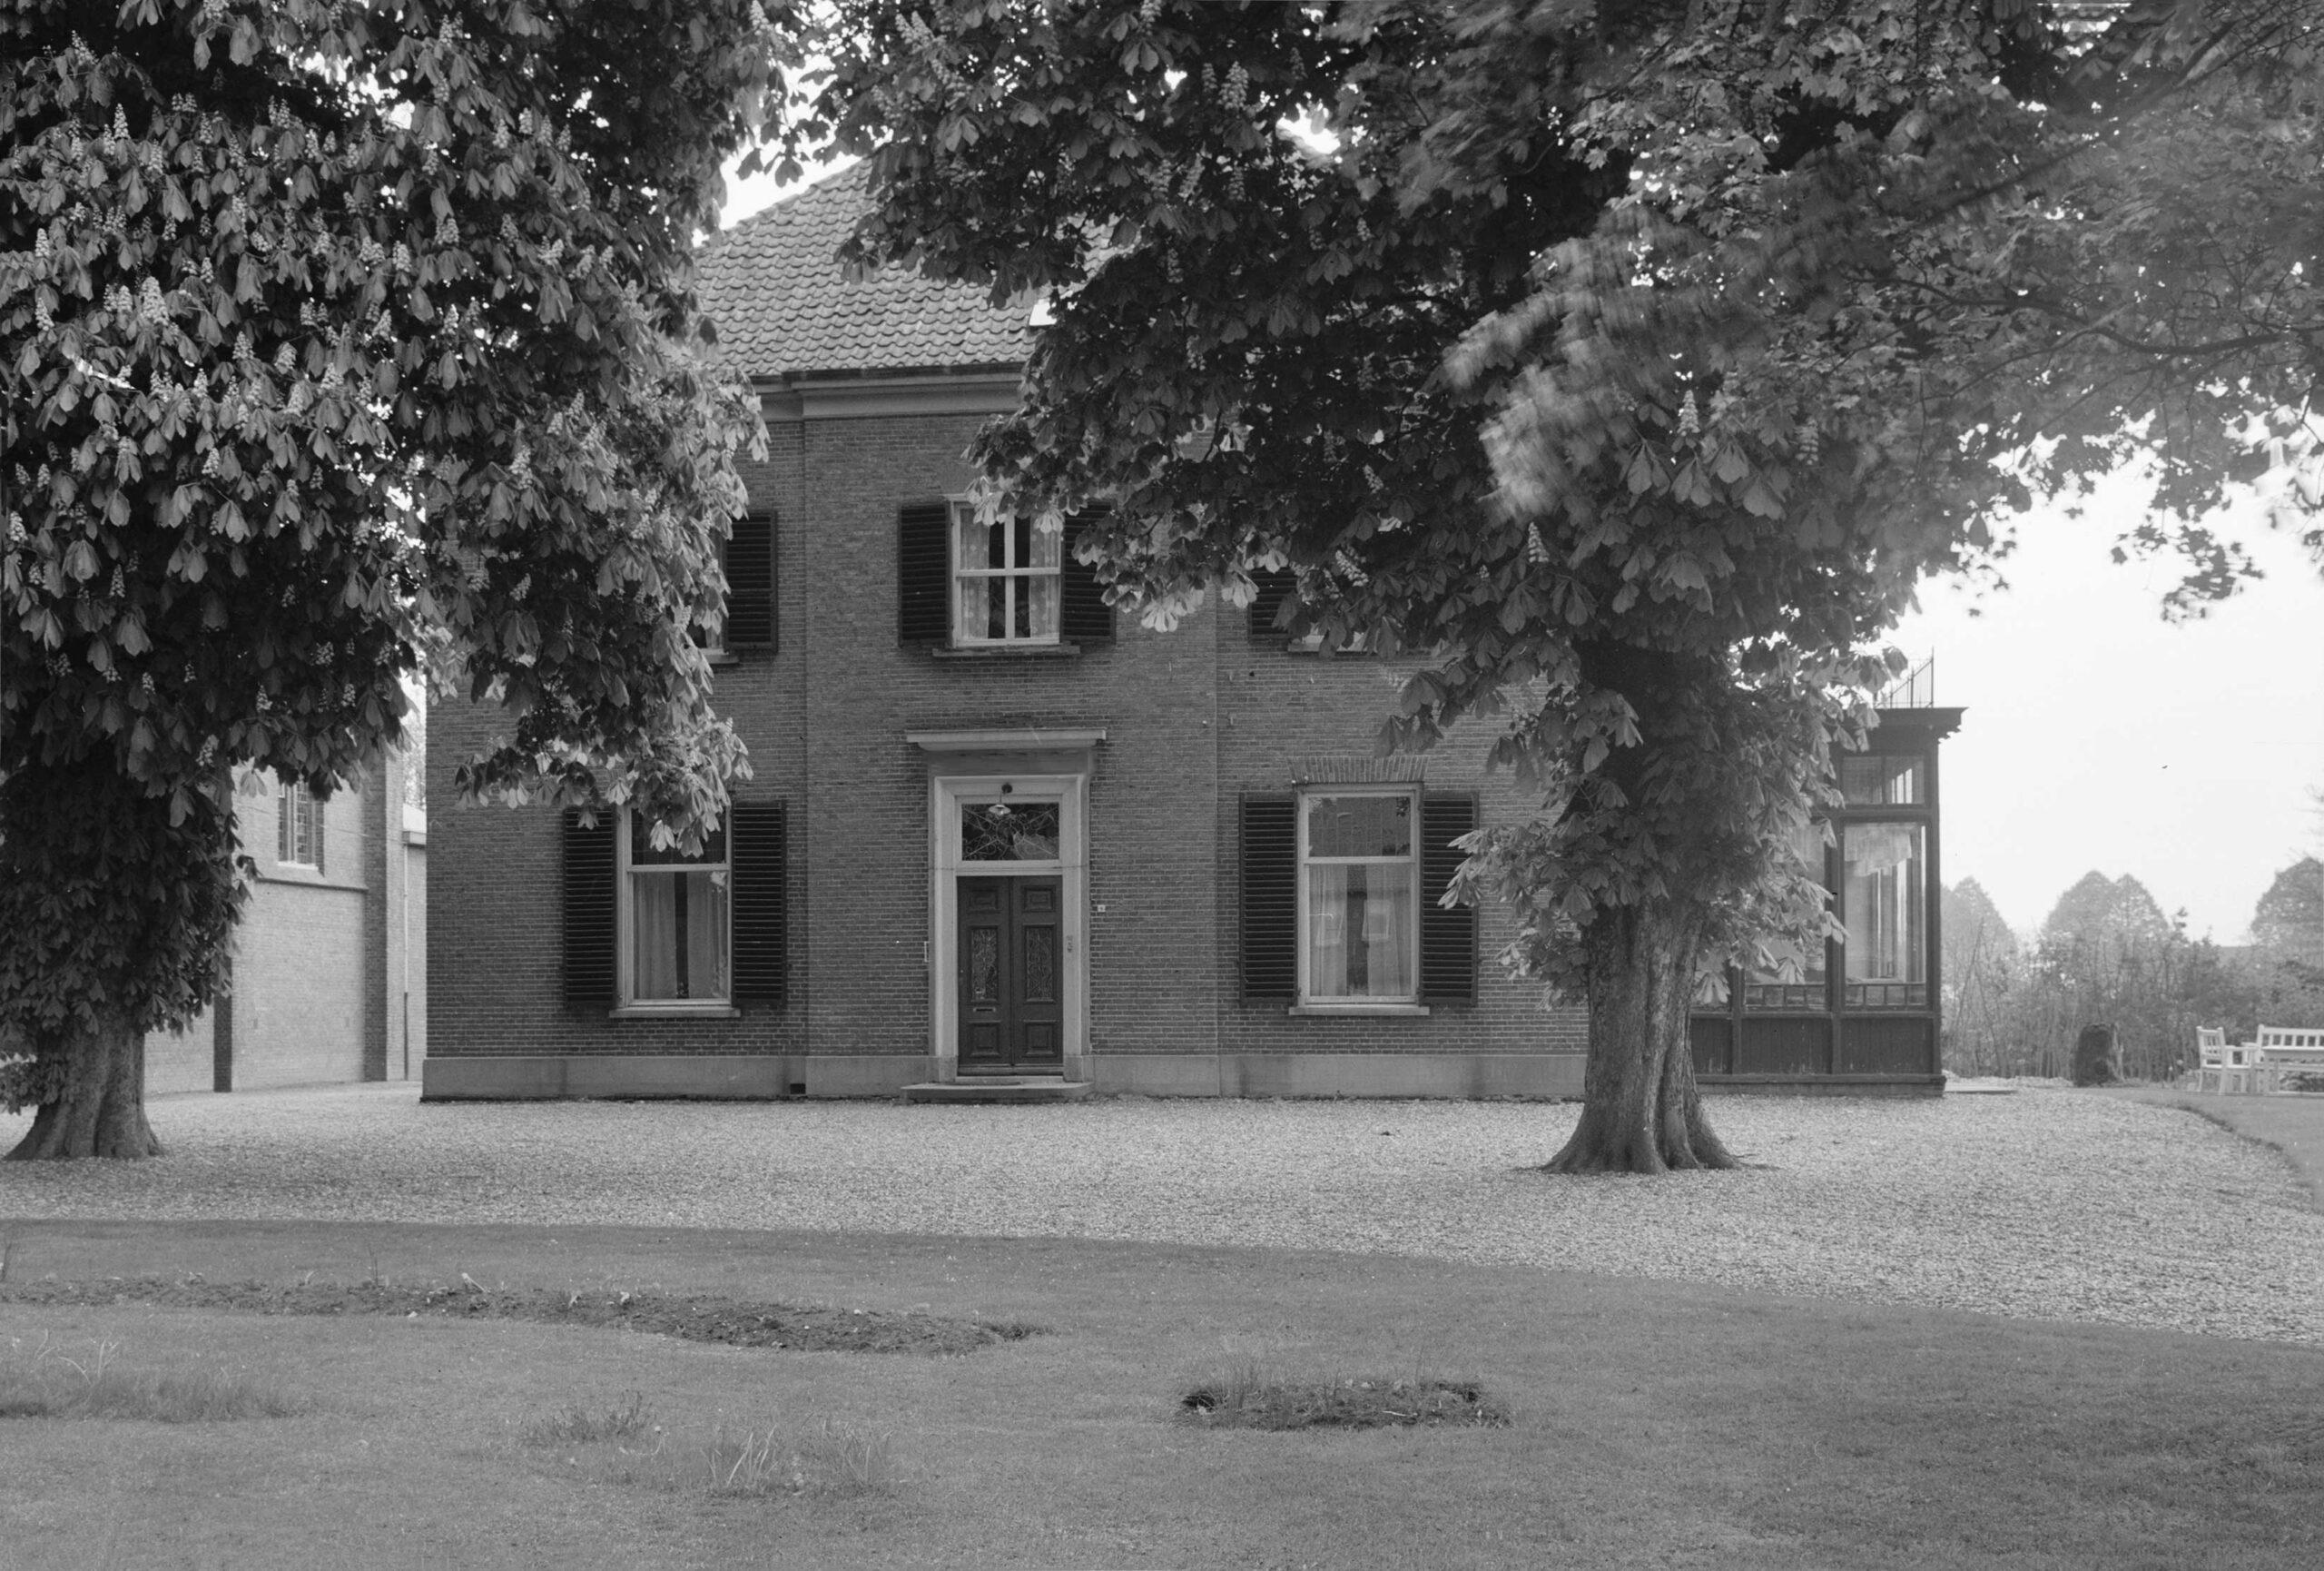 Keijenborg Kerkstraat 9 Pastorie